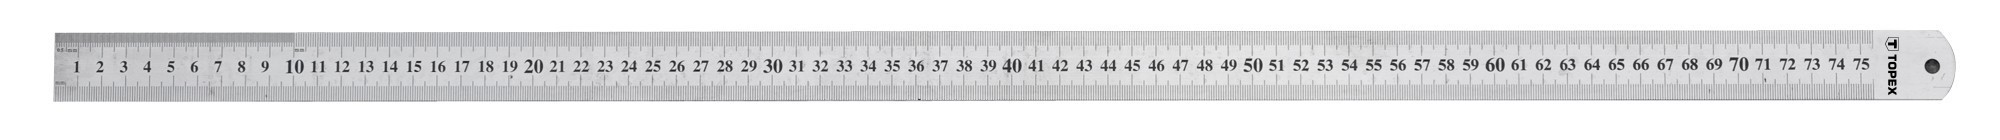 Acélvonalzó 750 mm rozsdamentes | TOPEX 31C075